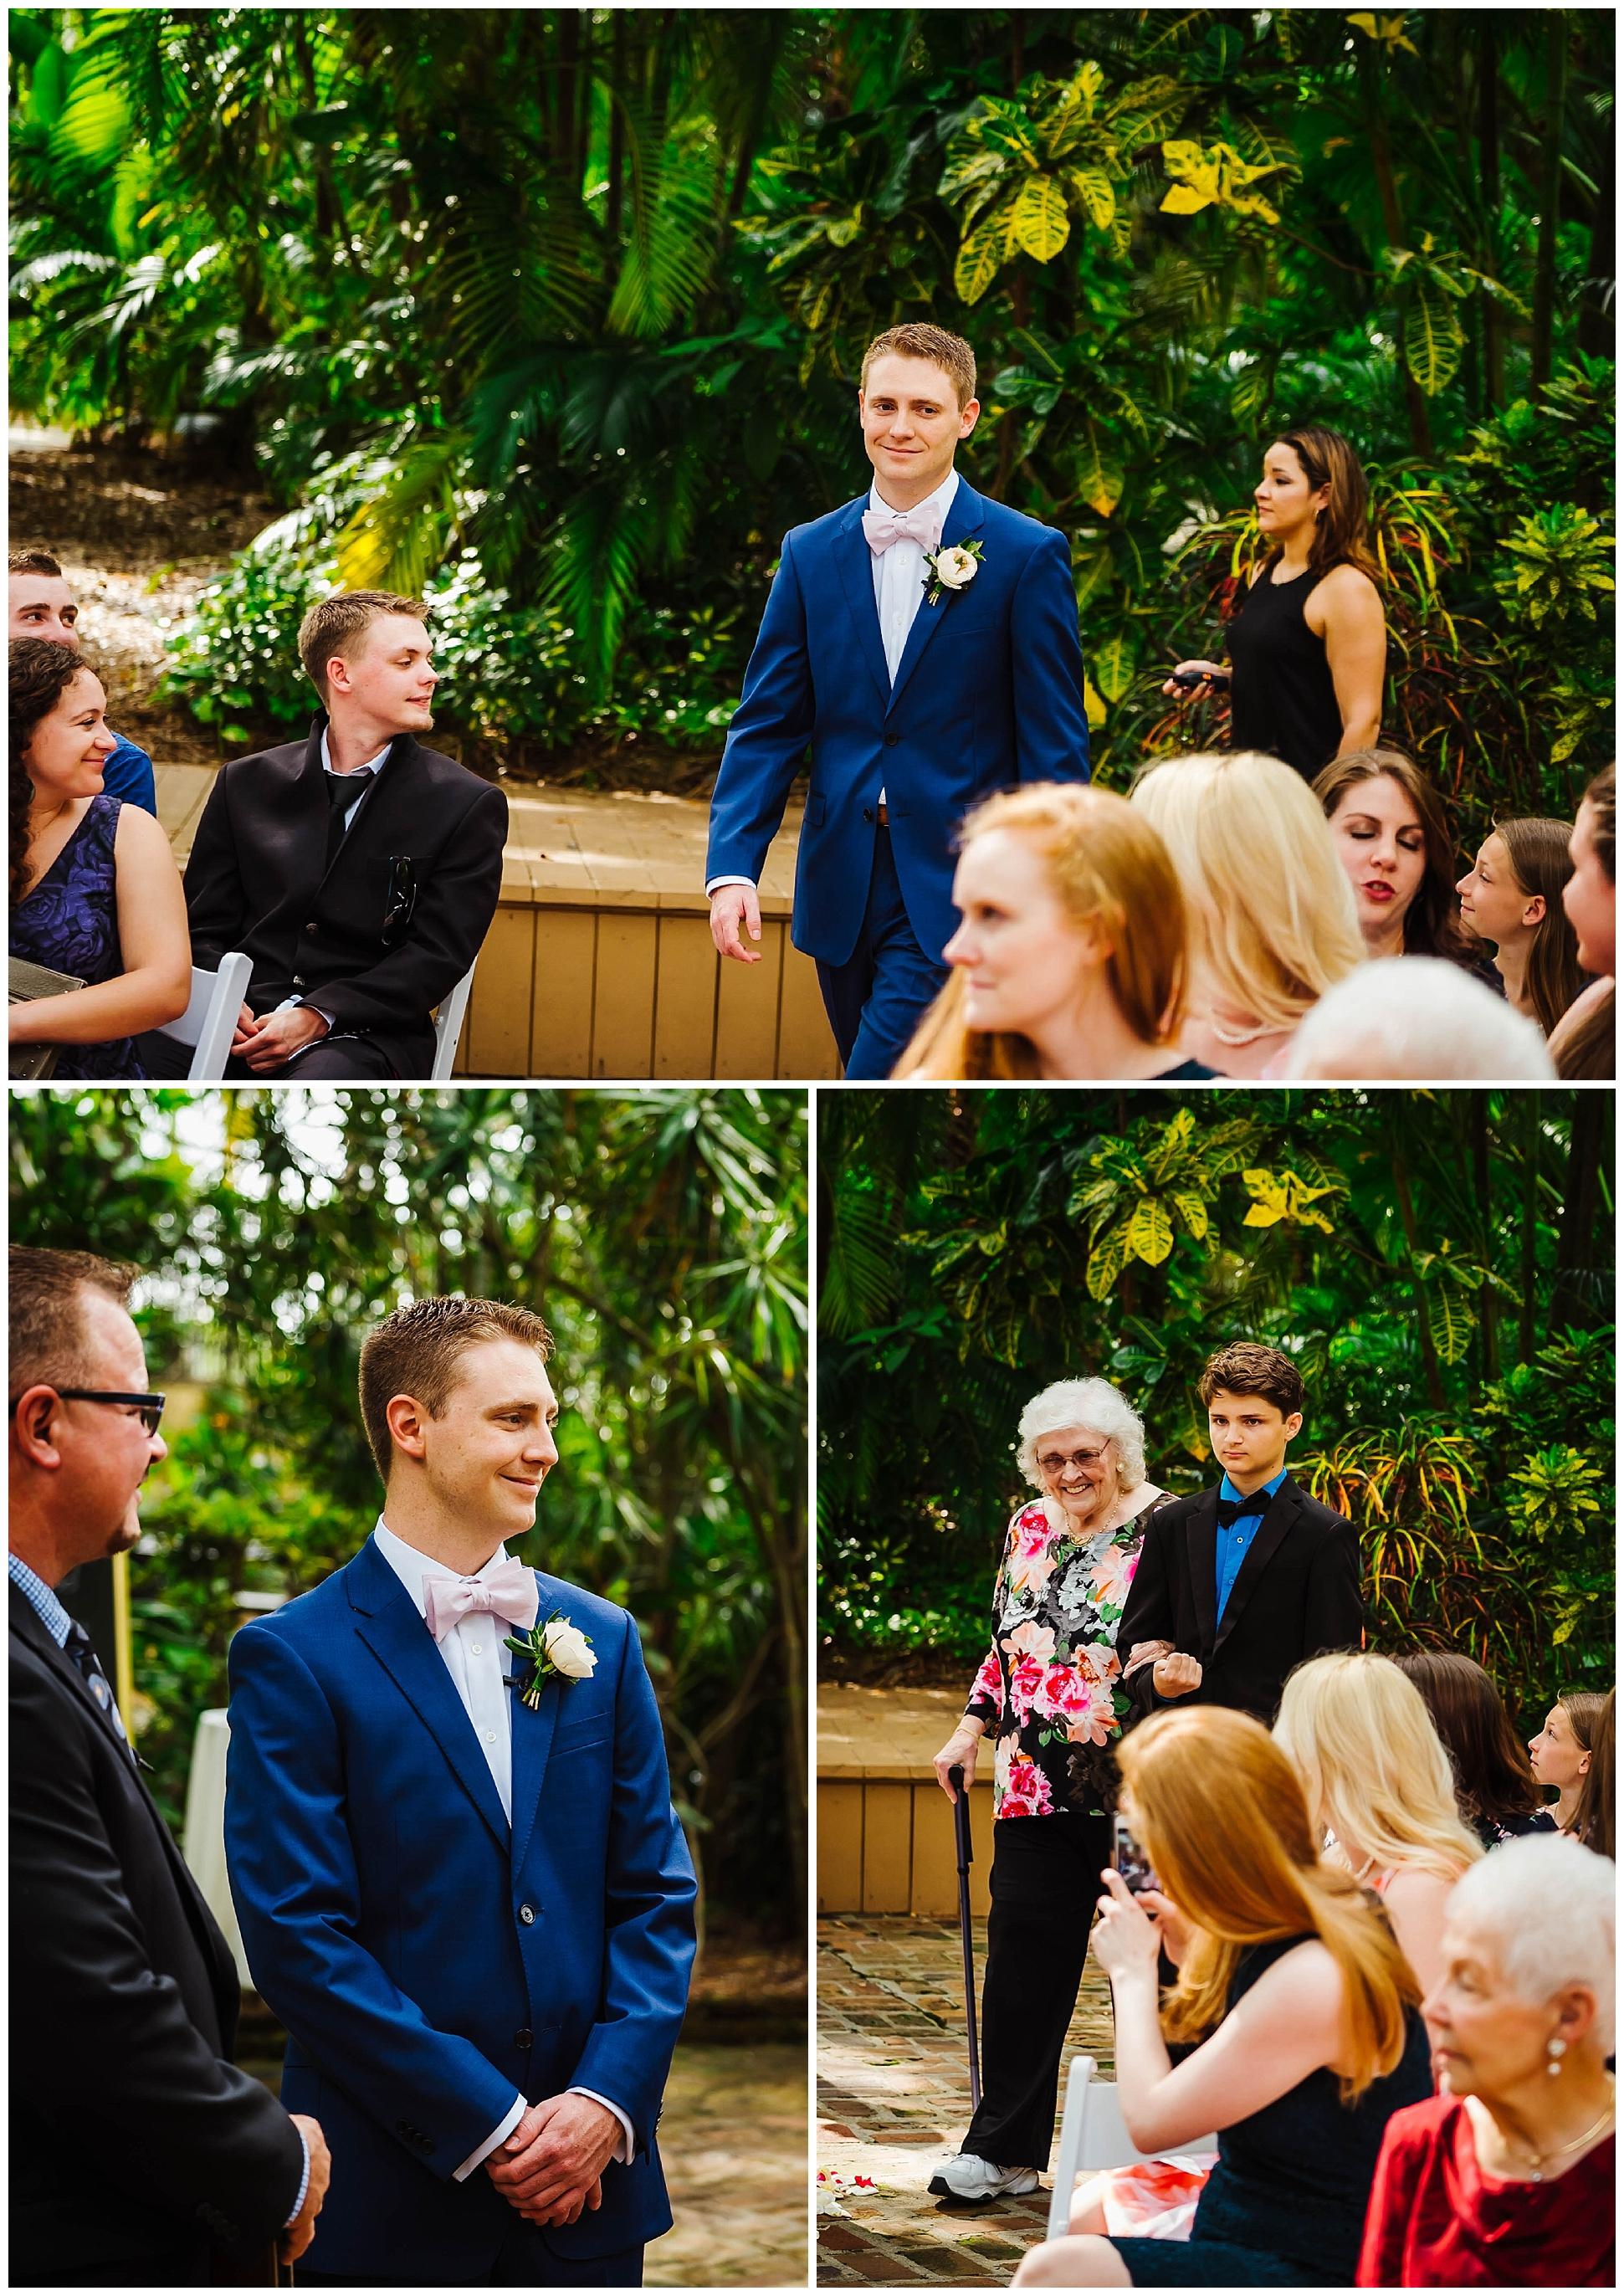 st-pete-wedding-photographer-sunken-gardens-crystal-ballroom-princess-dancer_0143.jpg